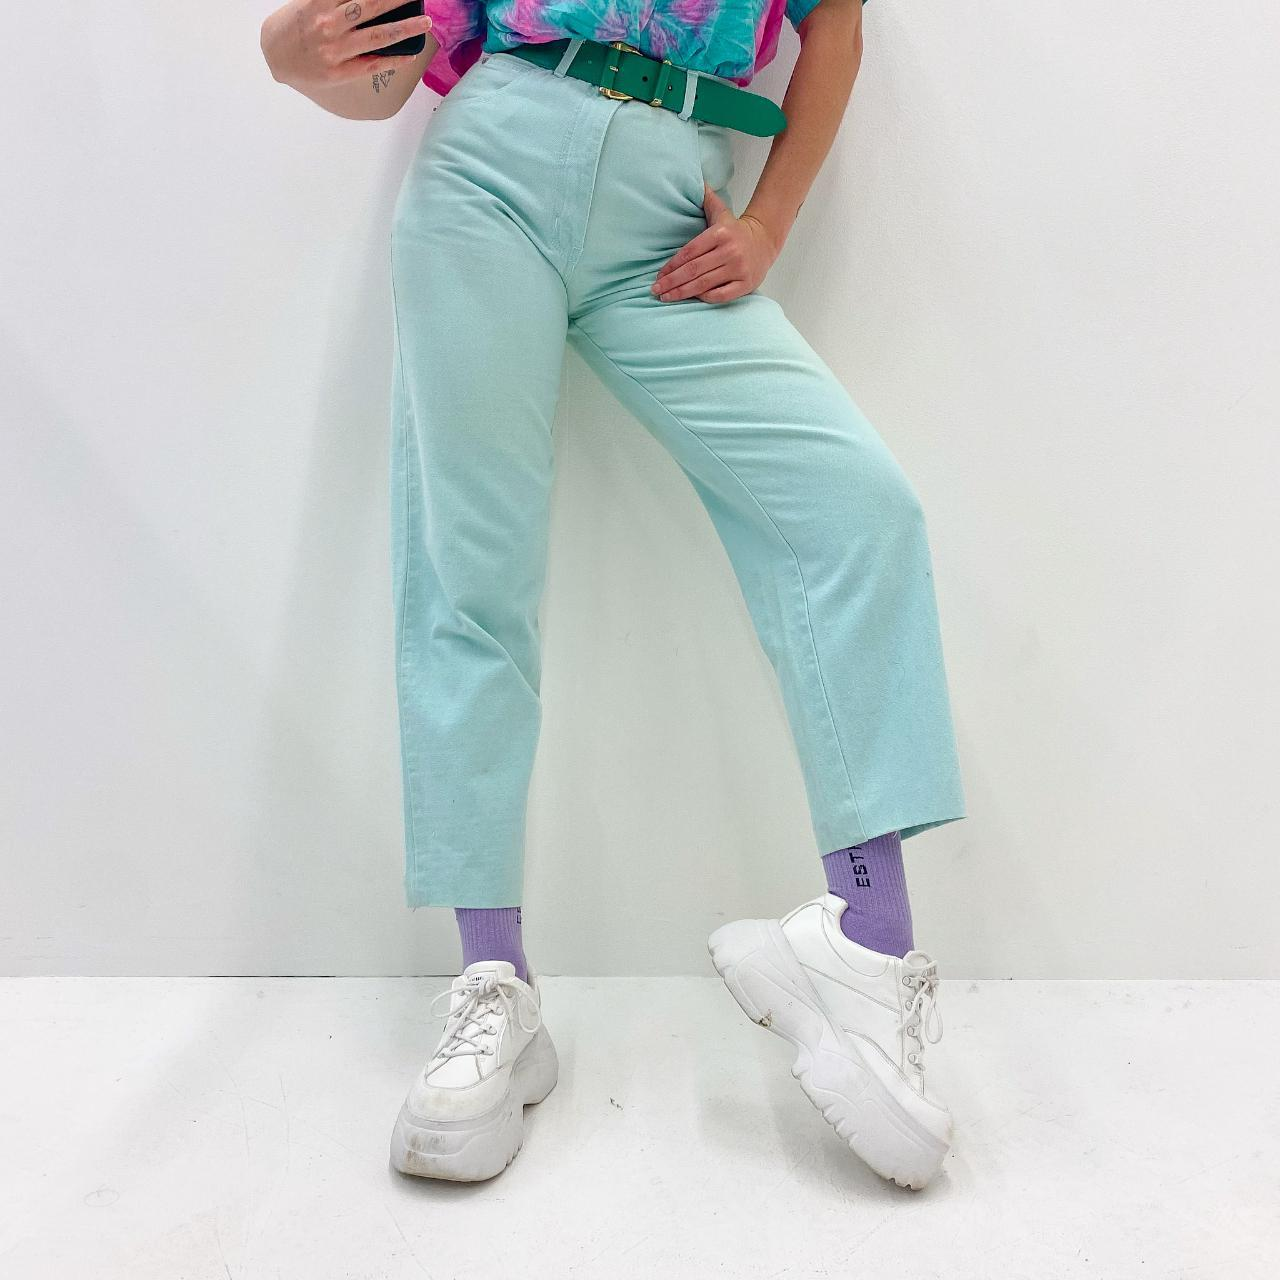 Product Image 1 - Mint Straight Leg Pants, vibrant